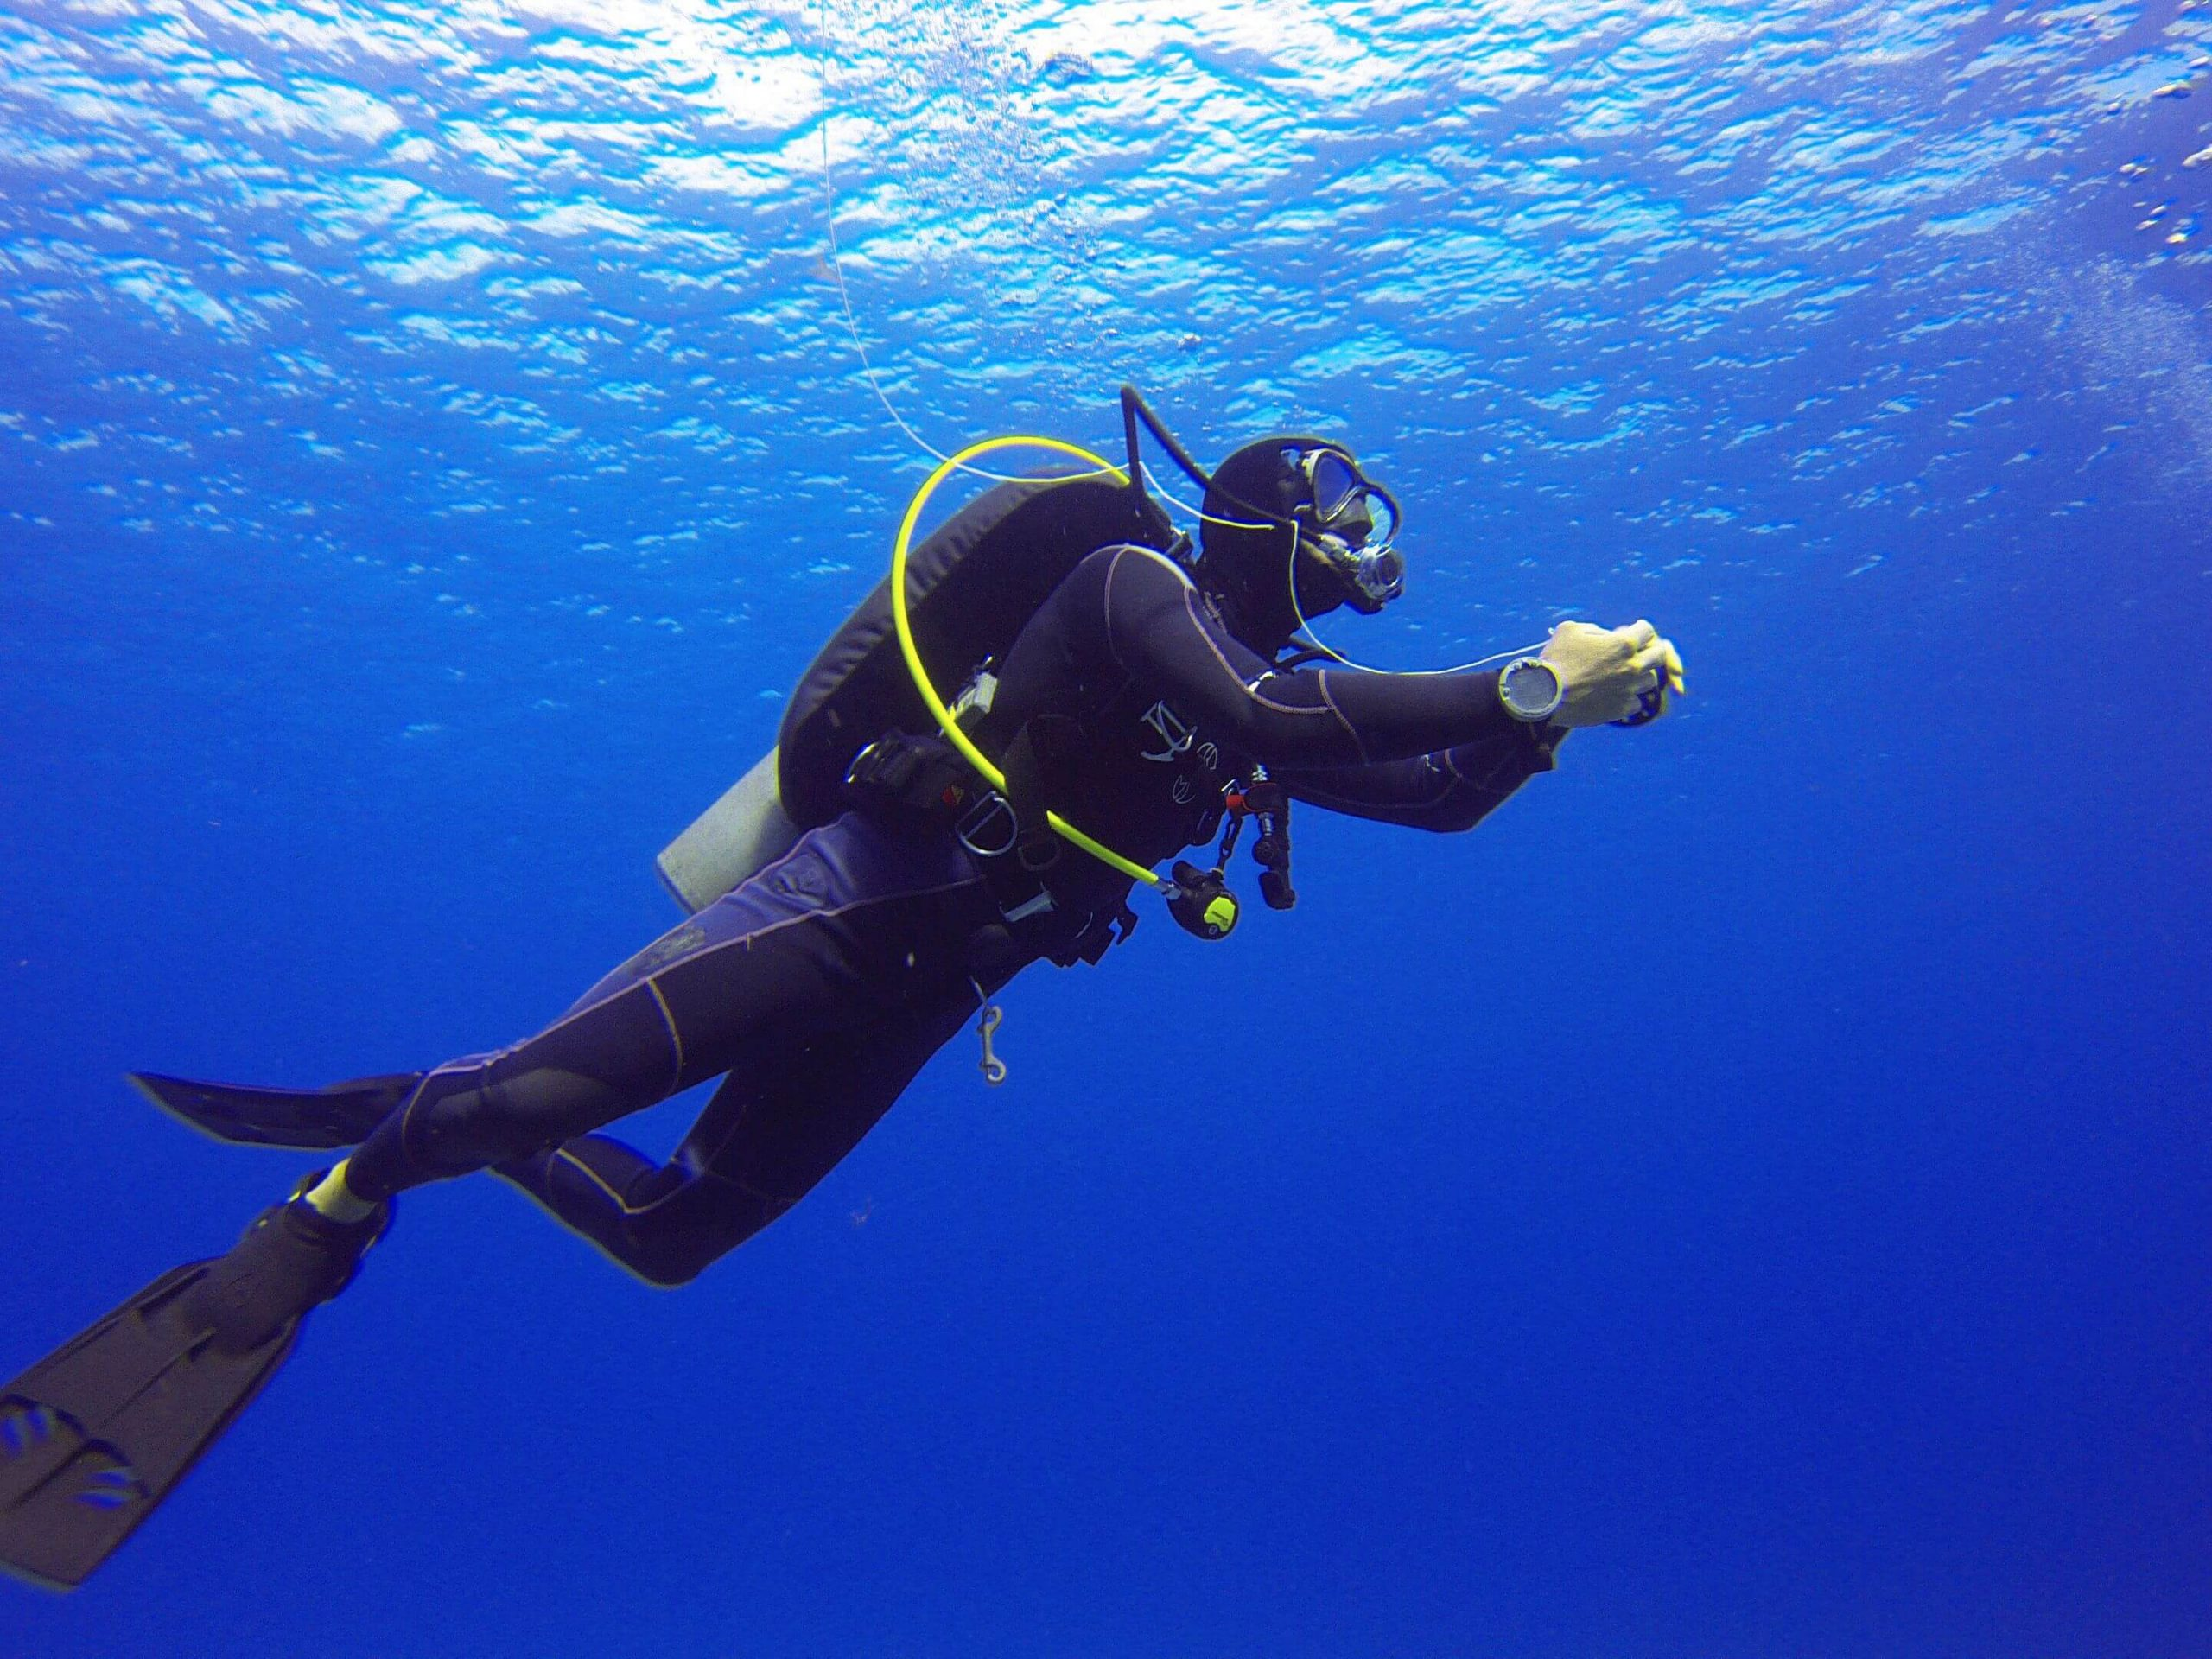 Not diving more often